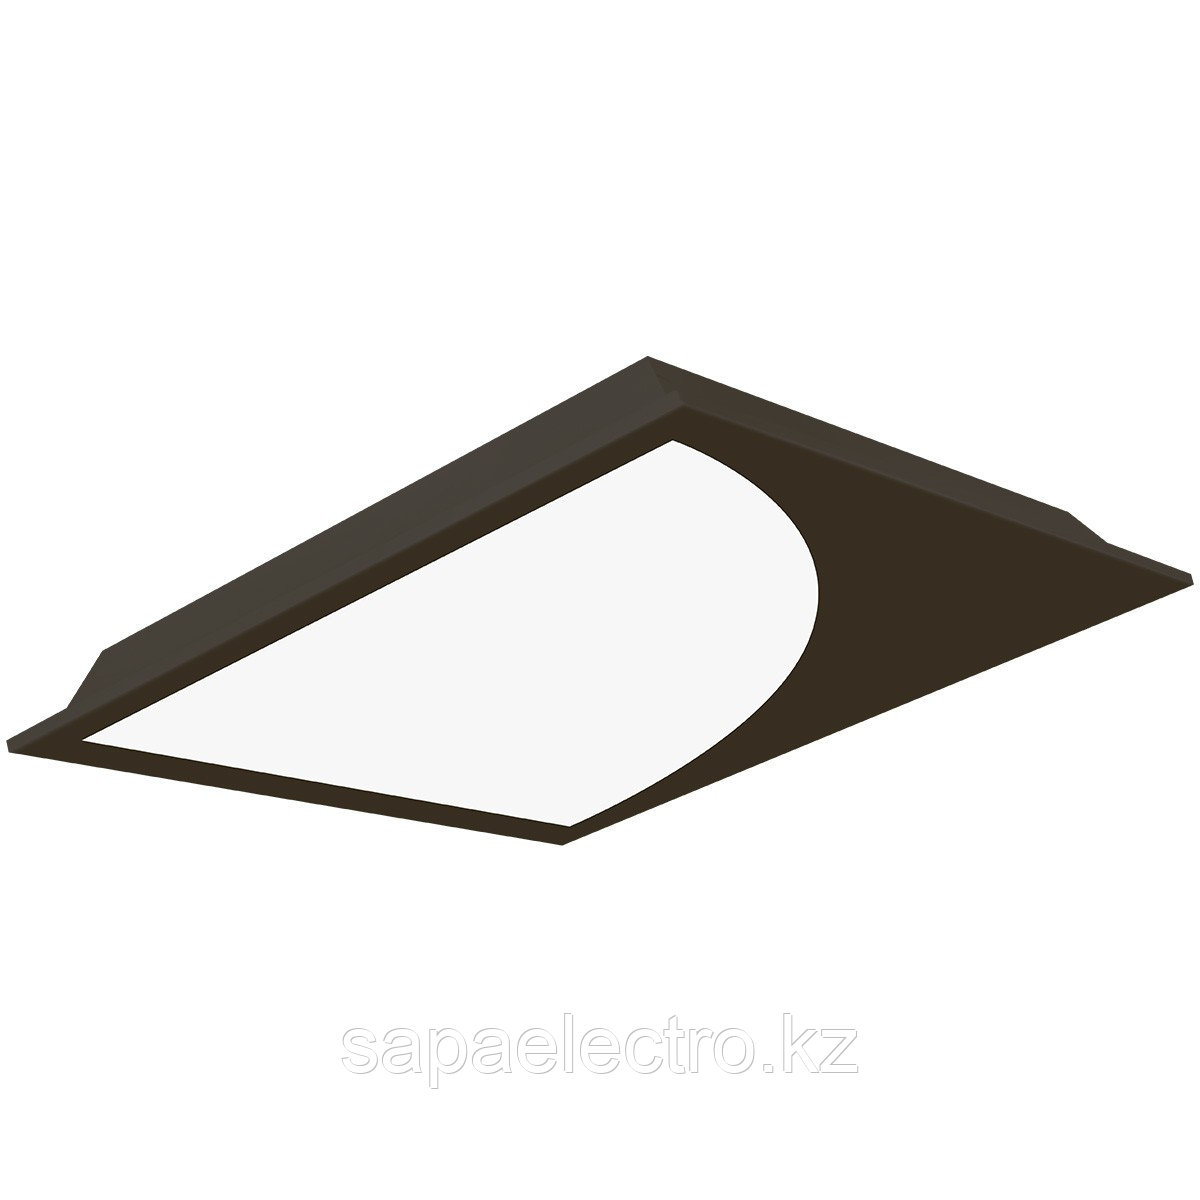 Св-к  OPALLED PLANET 48W BLACK S/A  600x600 4500K